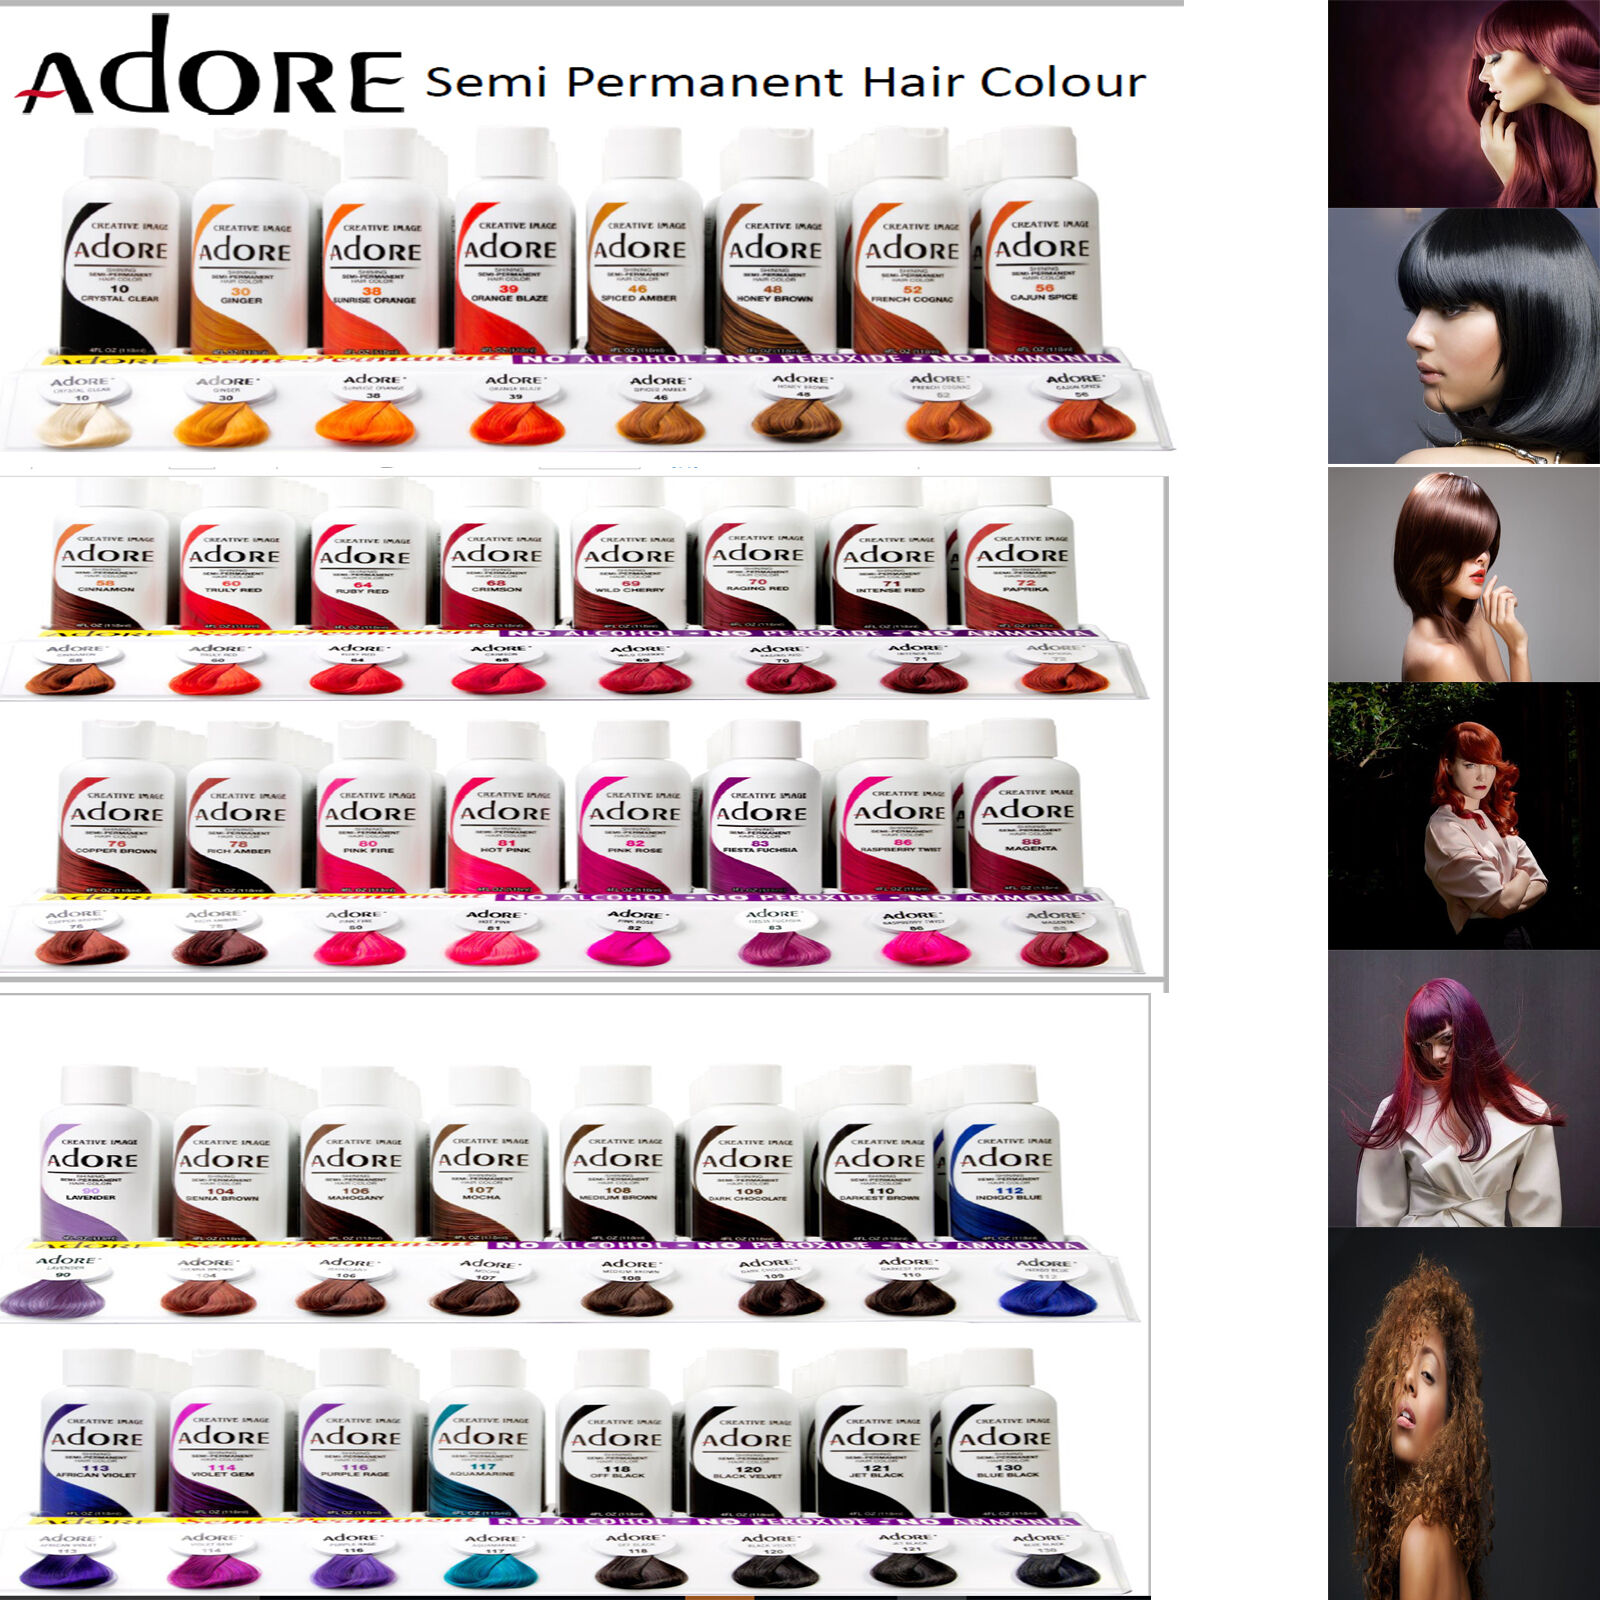 Adore Semi Permanent Hair Dye Colour Ammonia Peroxide